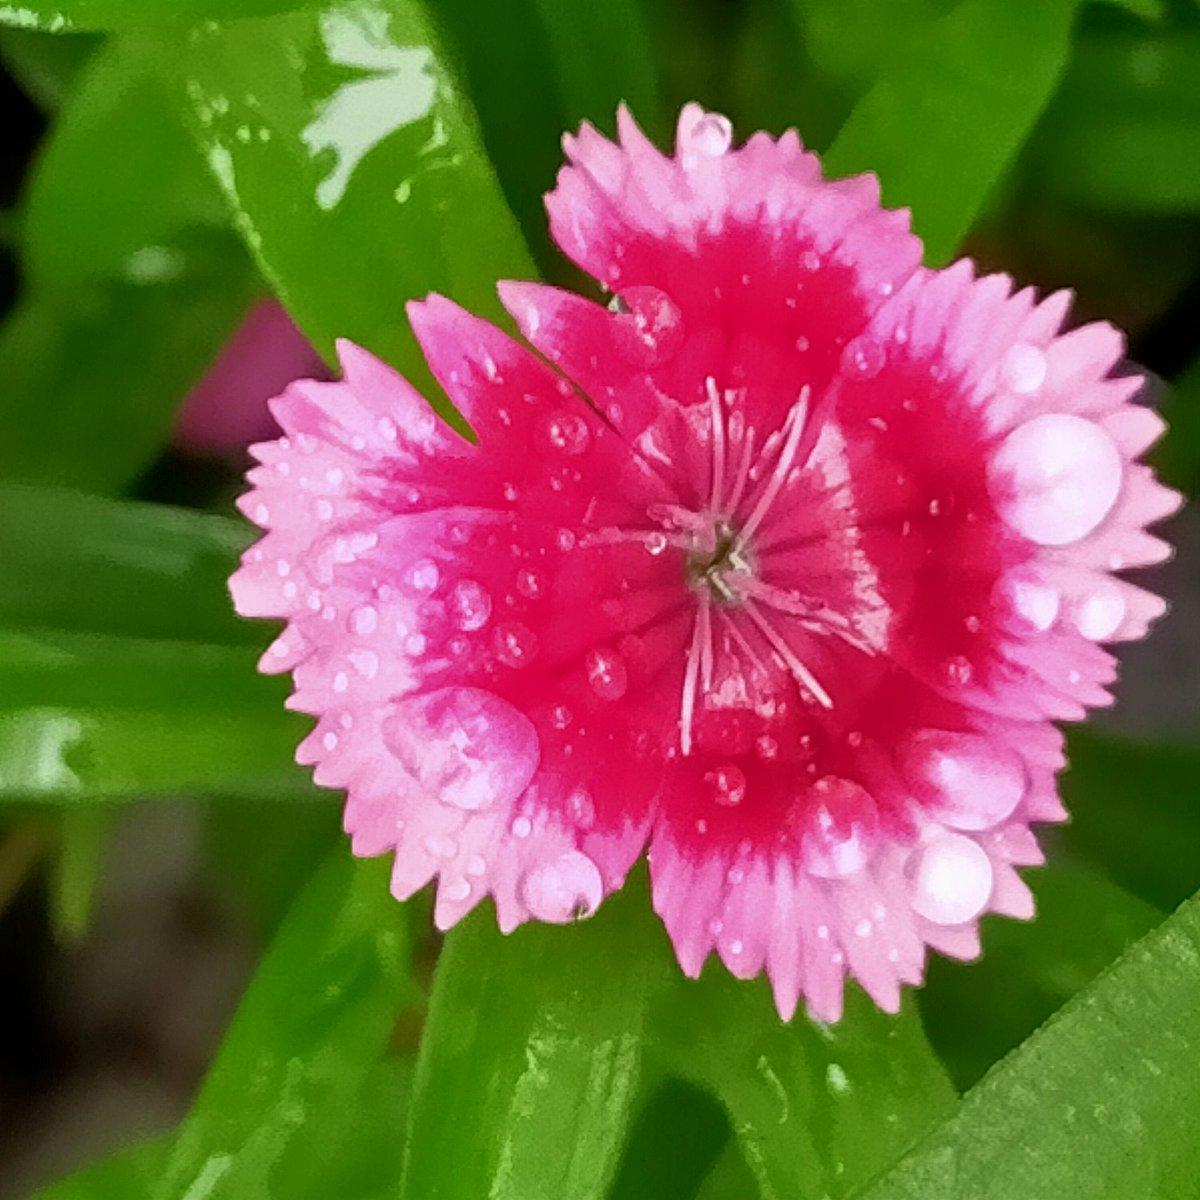 Colours my heart 💓 pink. Pink rain. 💓💓#mindfulness